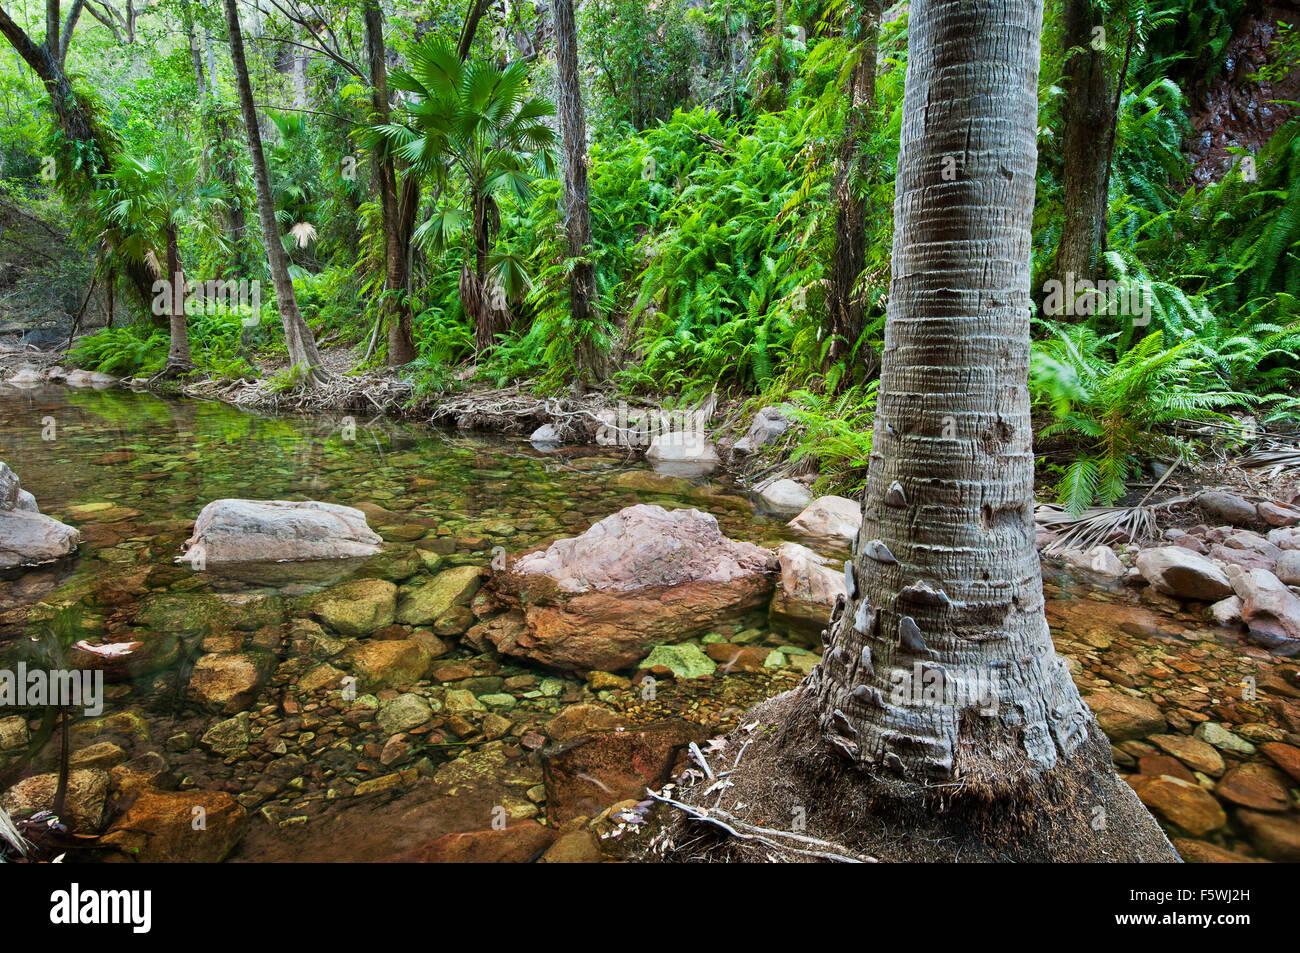 Livistona Palmen in El Questro Gorge. Stockbild